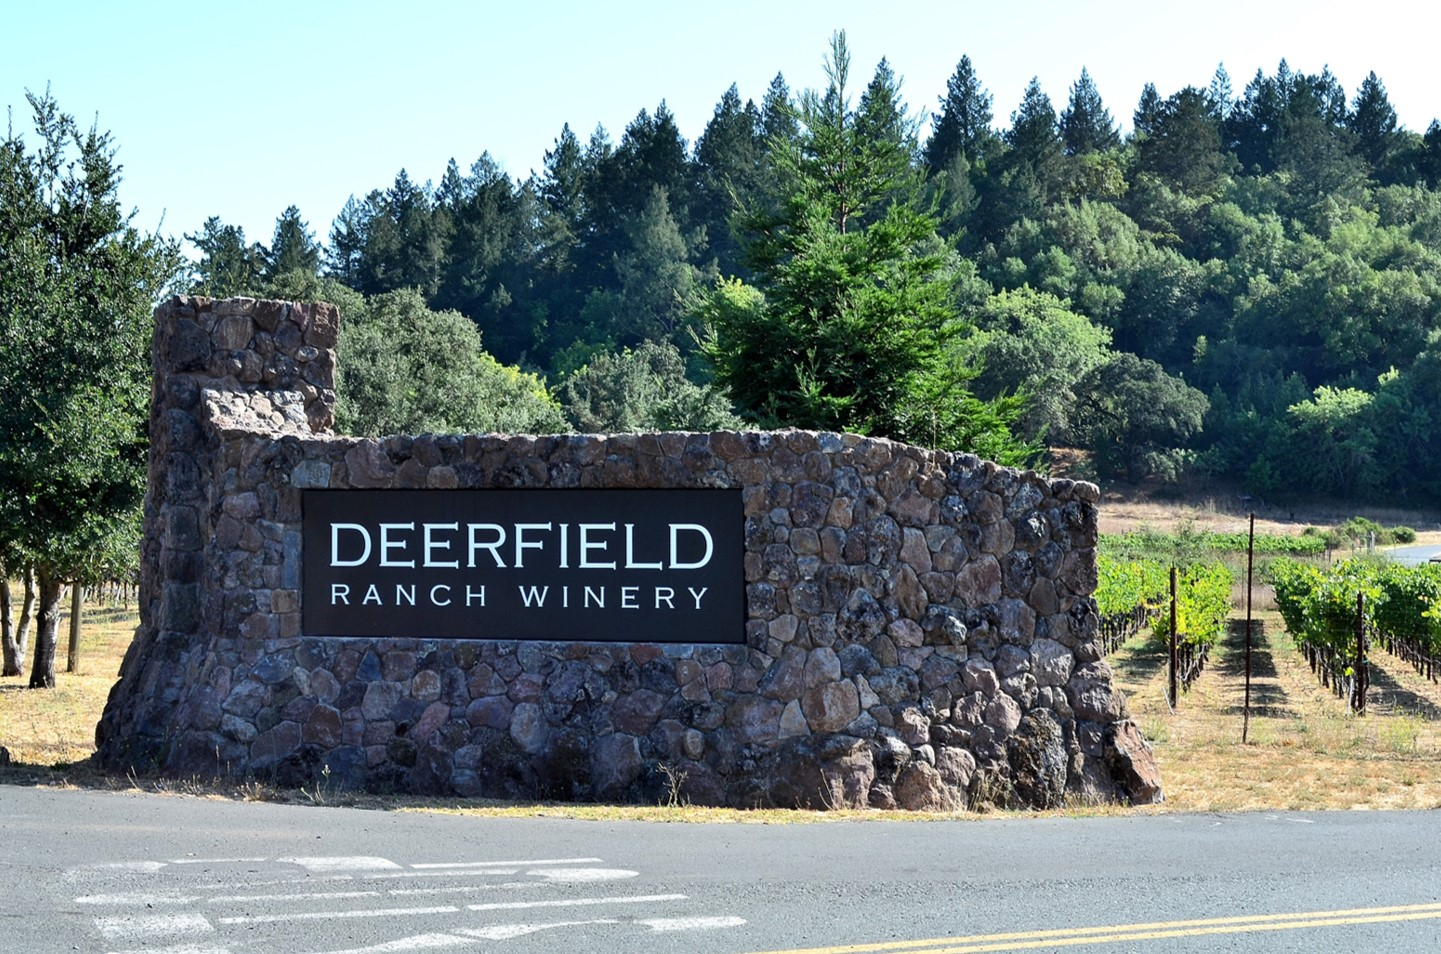 Deerfield Ranch Winery sign